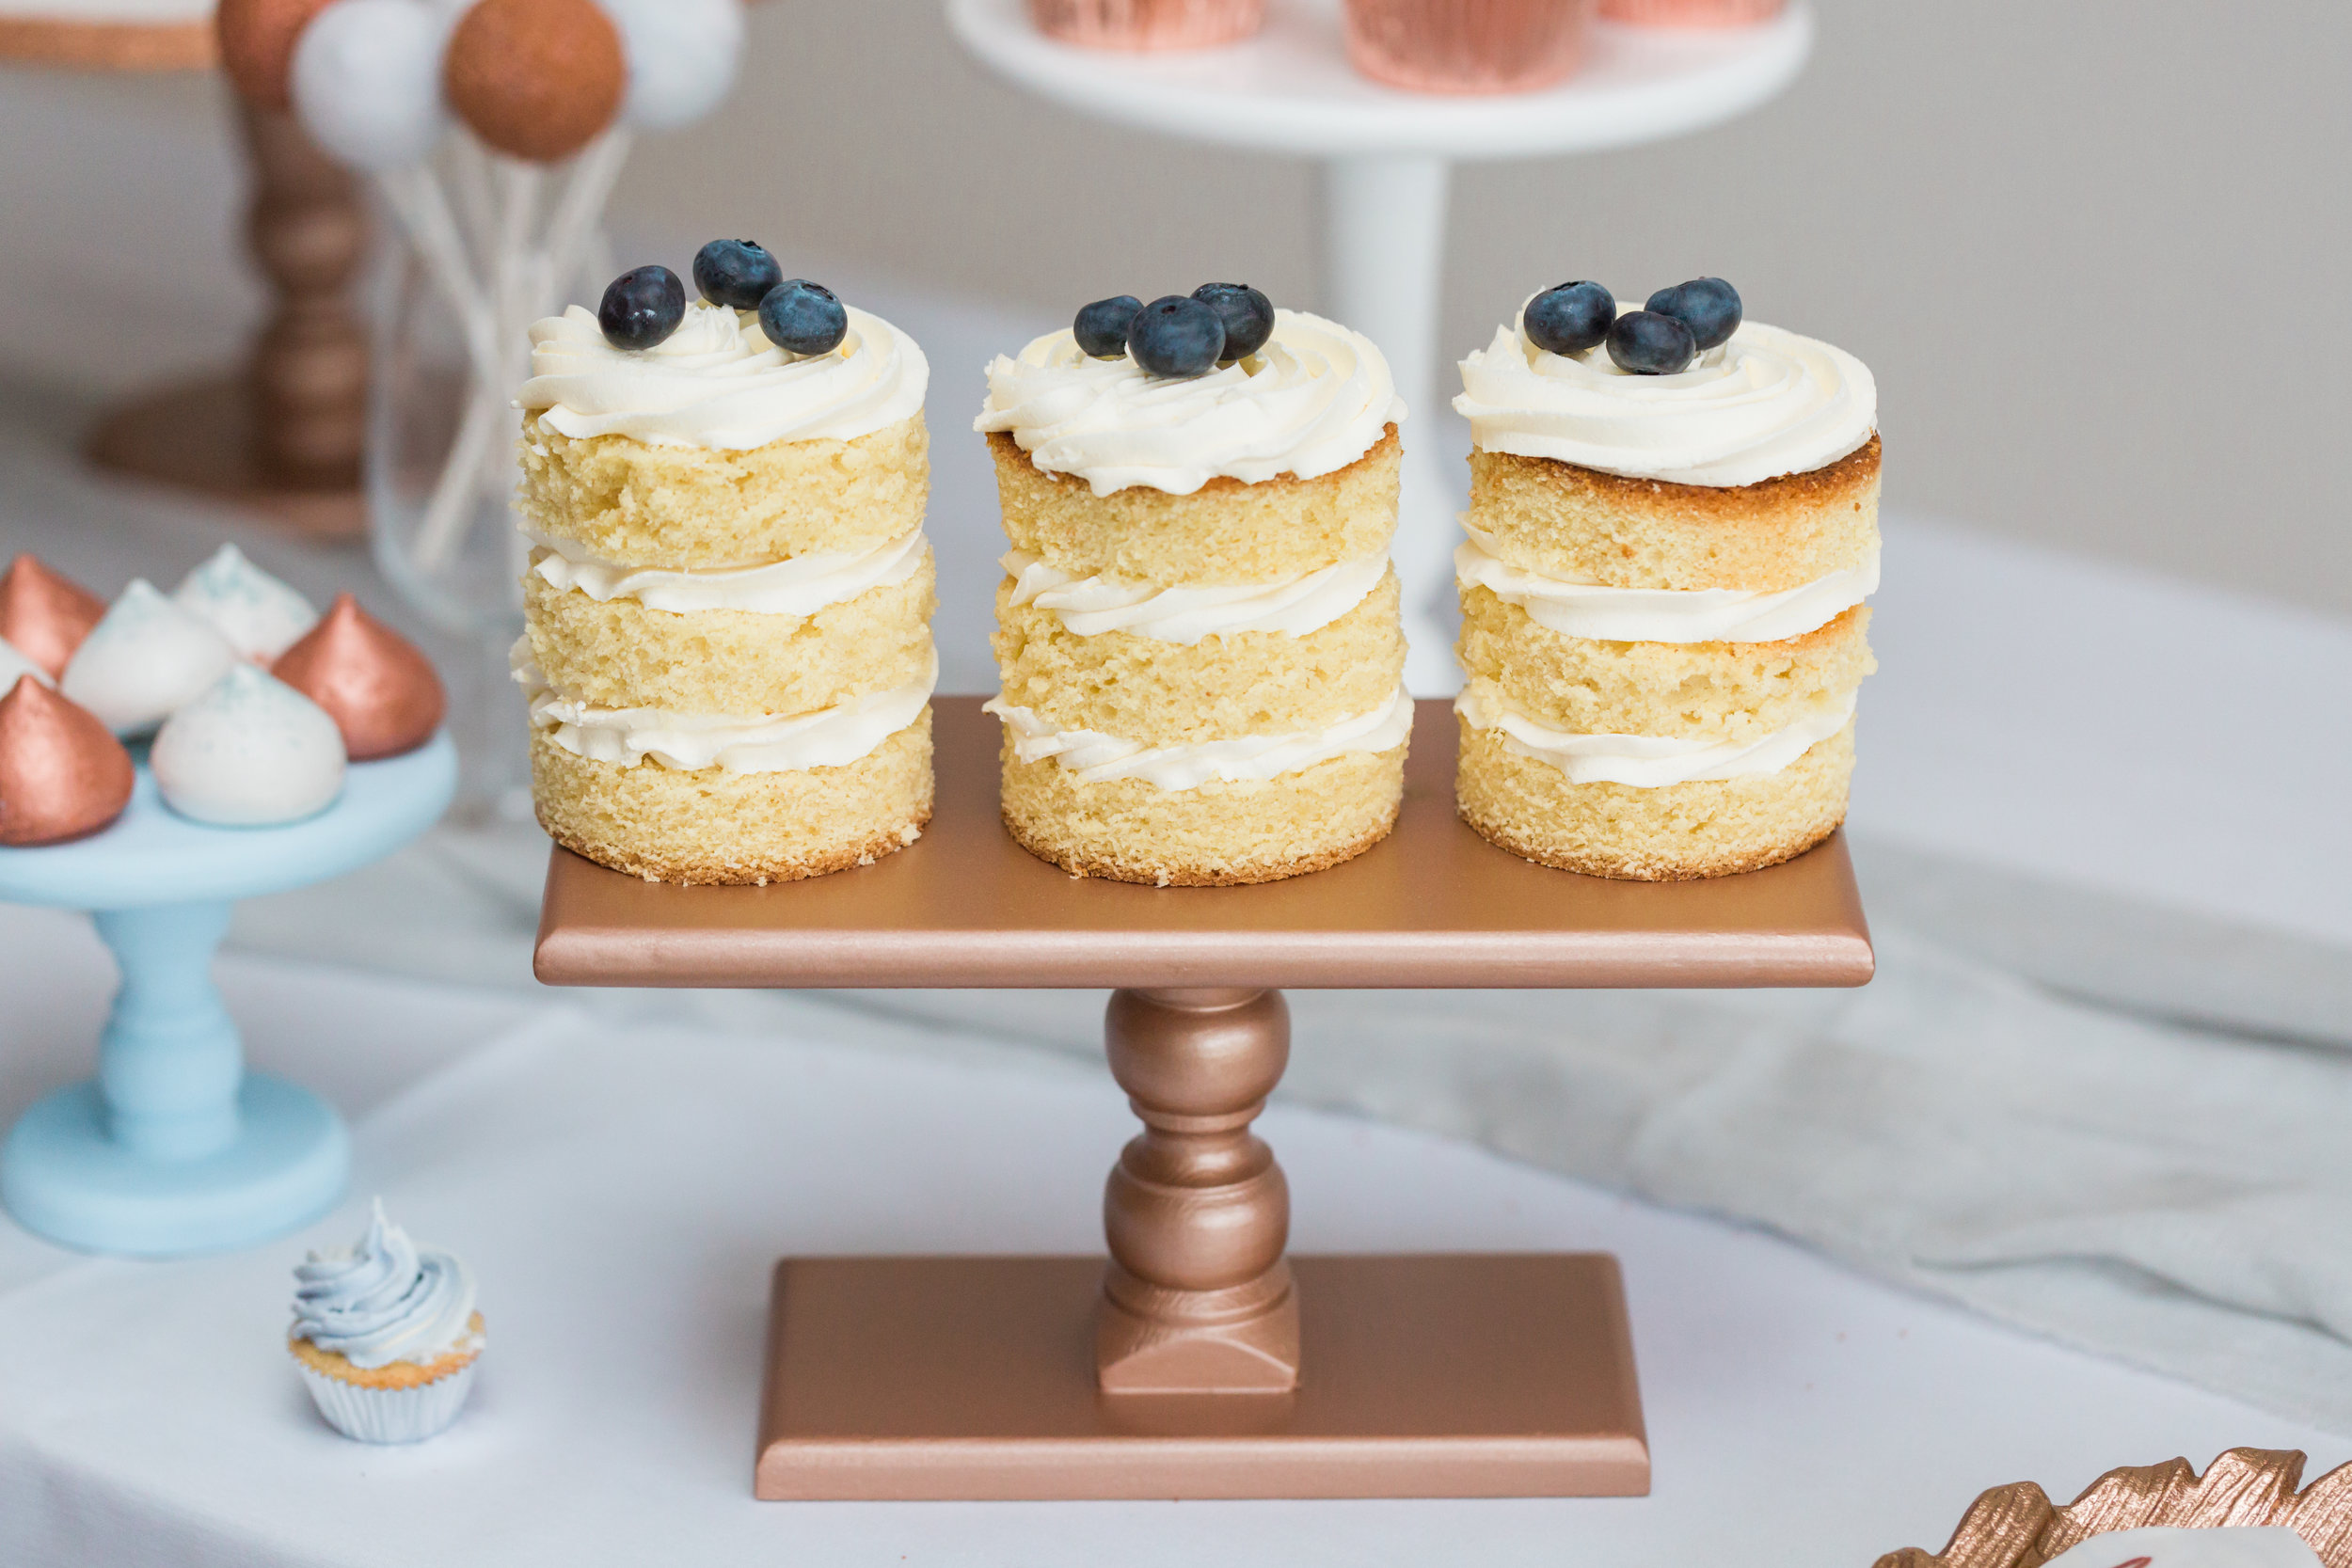 trio-of-cakes.jpg